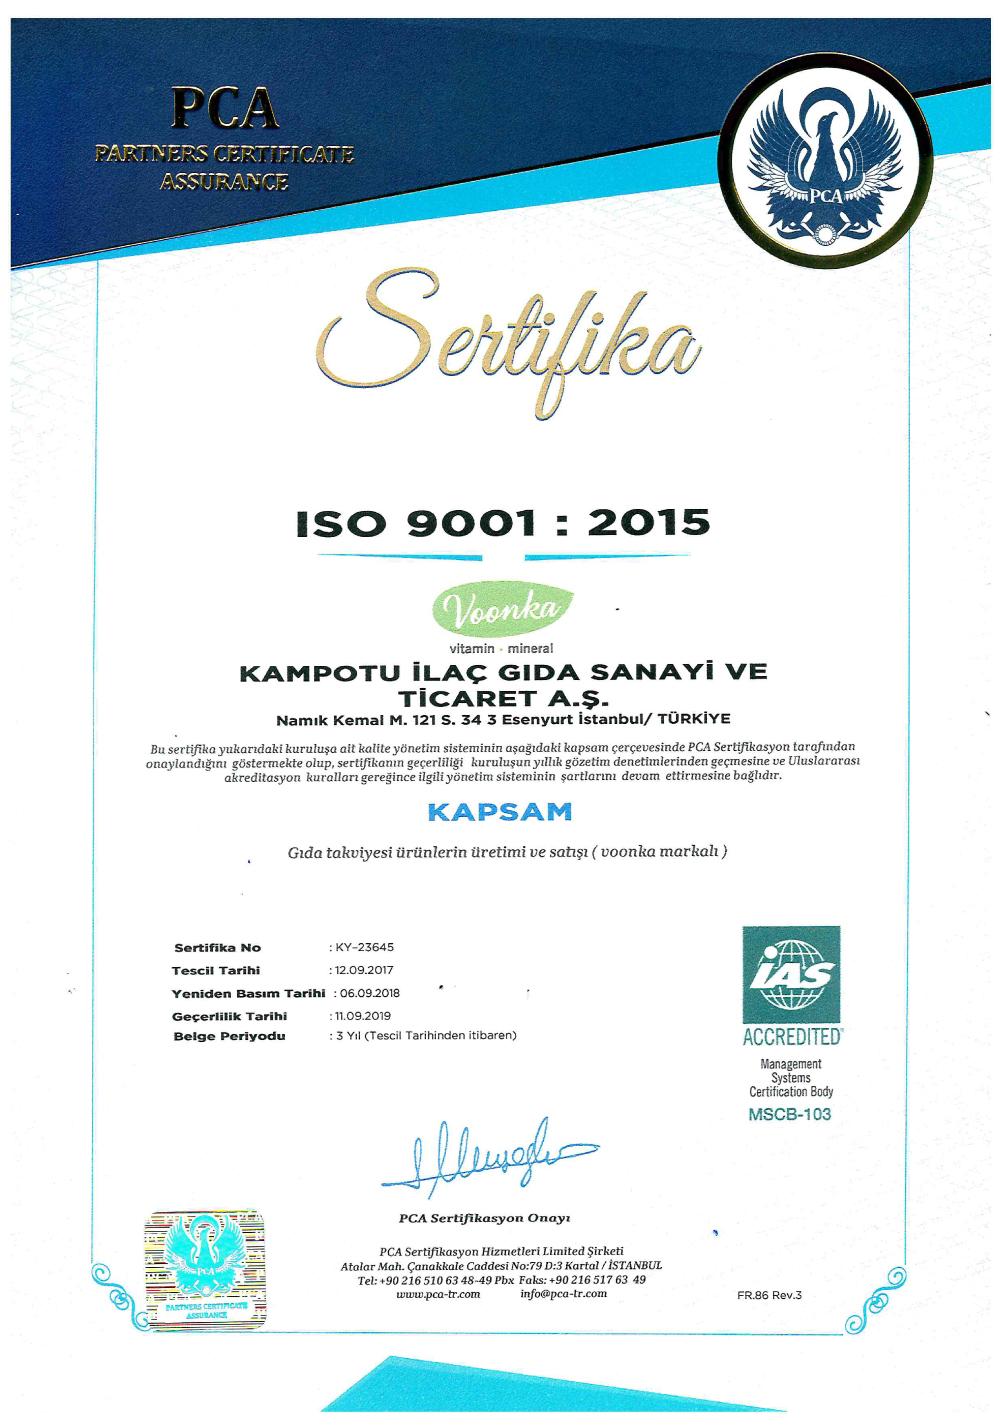 iso9001-2015-kalite-yonetim-sistemi-sertifikasi-2018